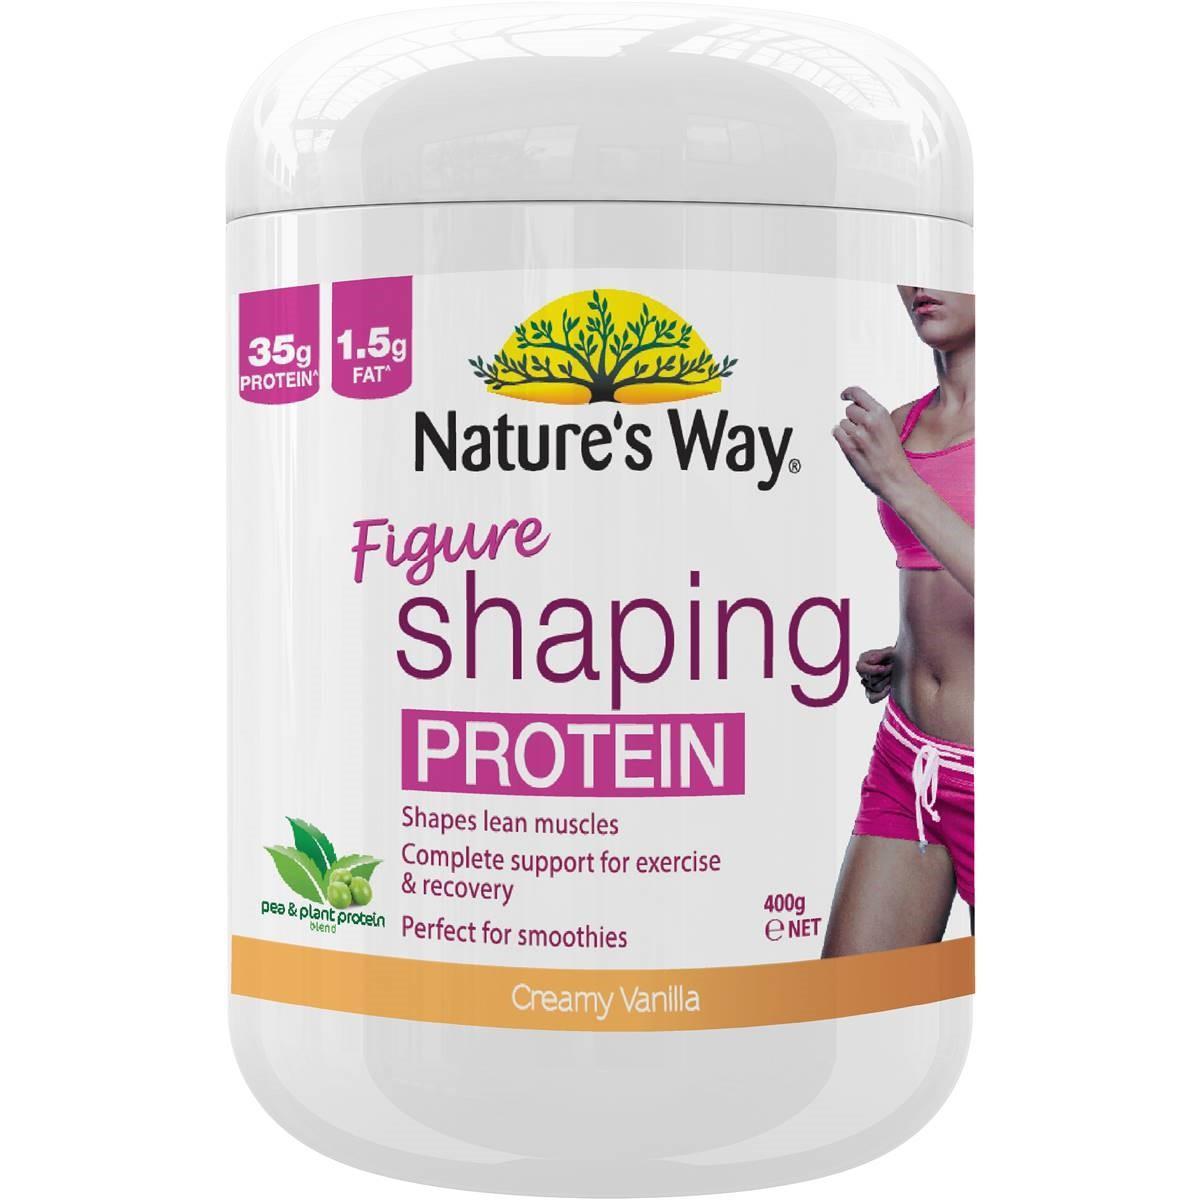 Natures Way Figure Shaping Protein (vanilla) Powder 400g May 2020 By Australia Health Warehouse.